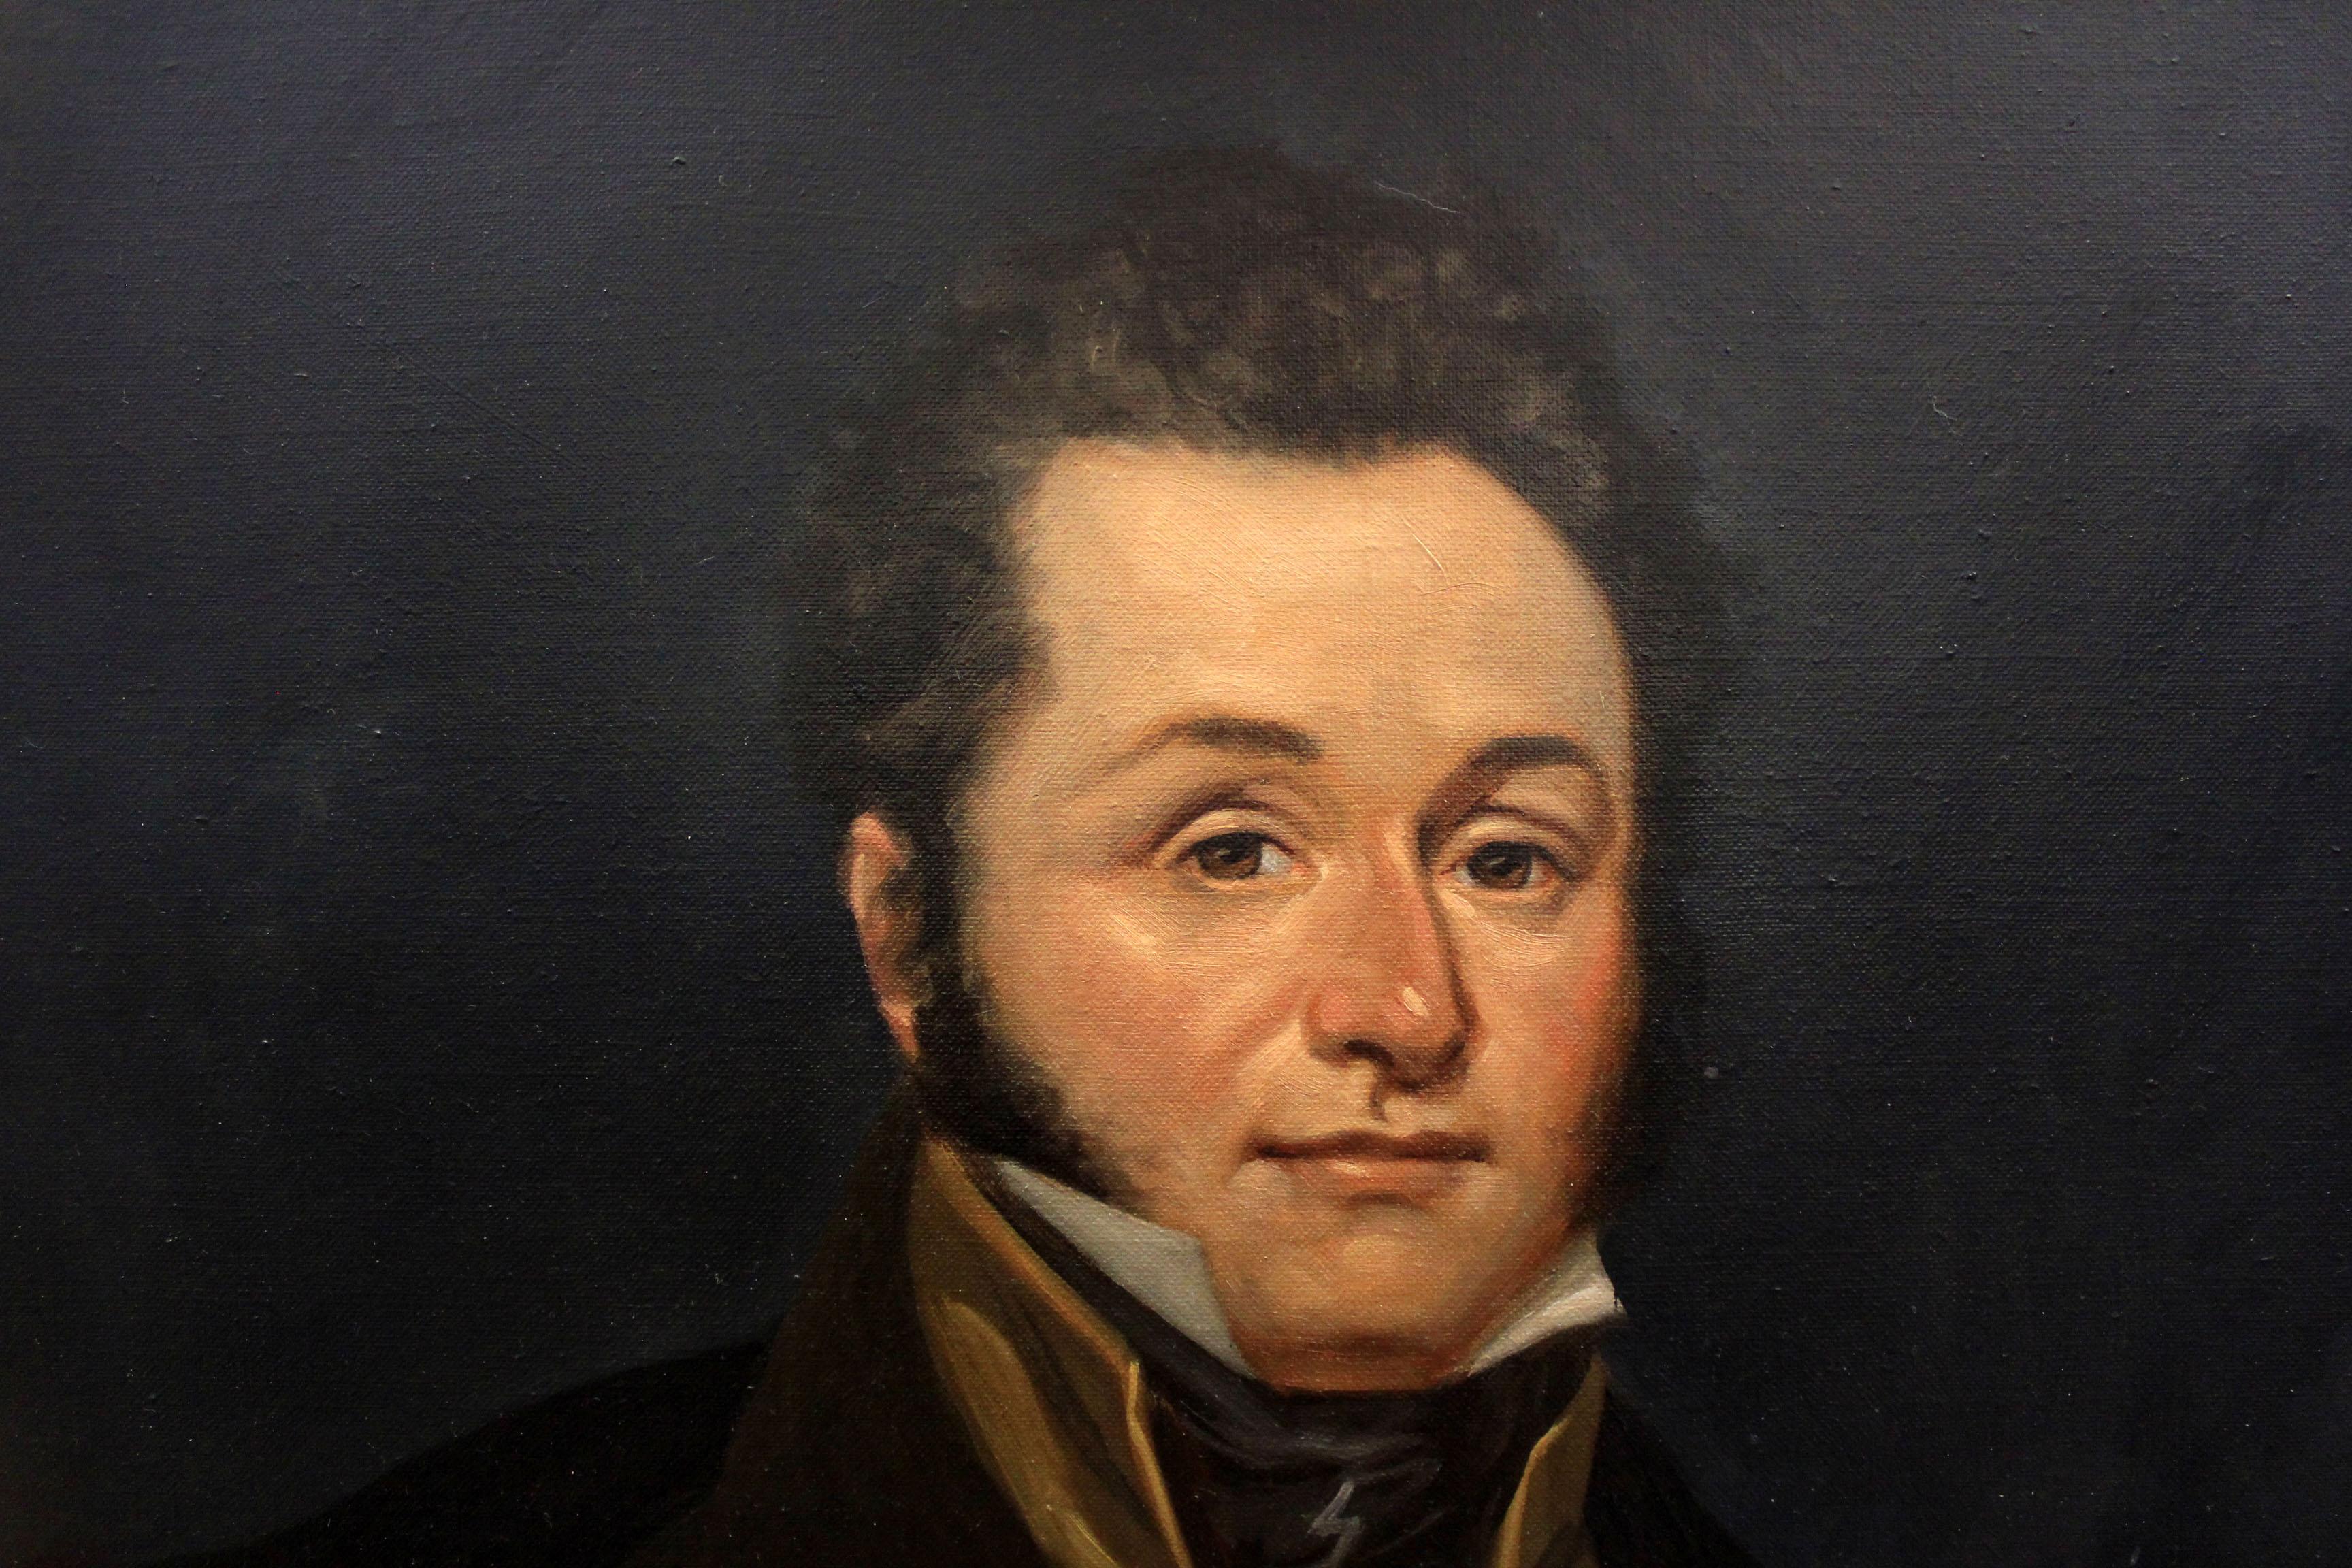 The Peace President >> Lorenzo De Zavala at San Jacinto Monument Photo and Information image - Free stock photo ...